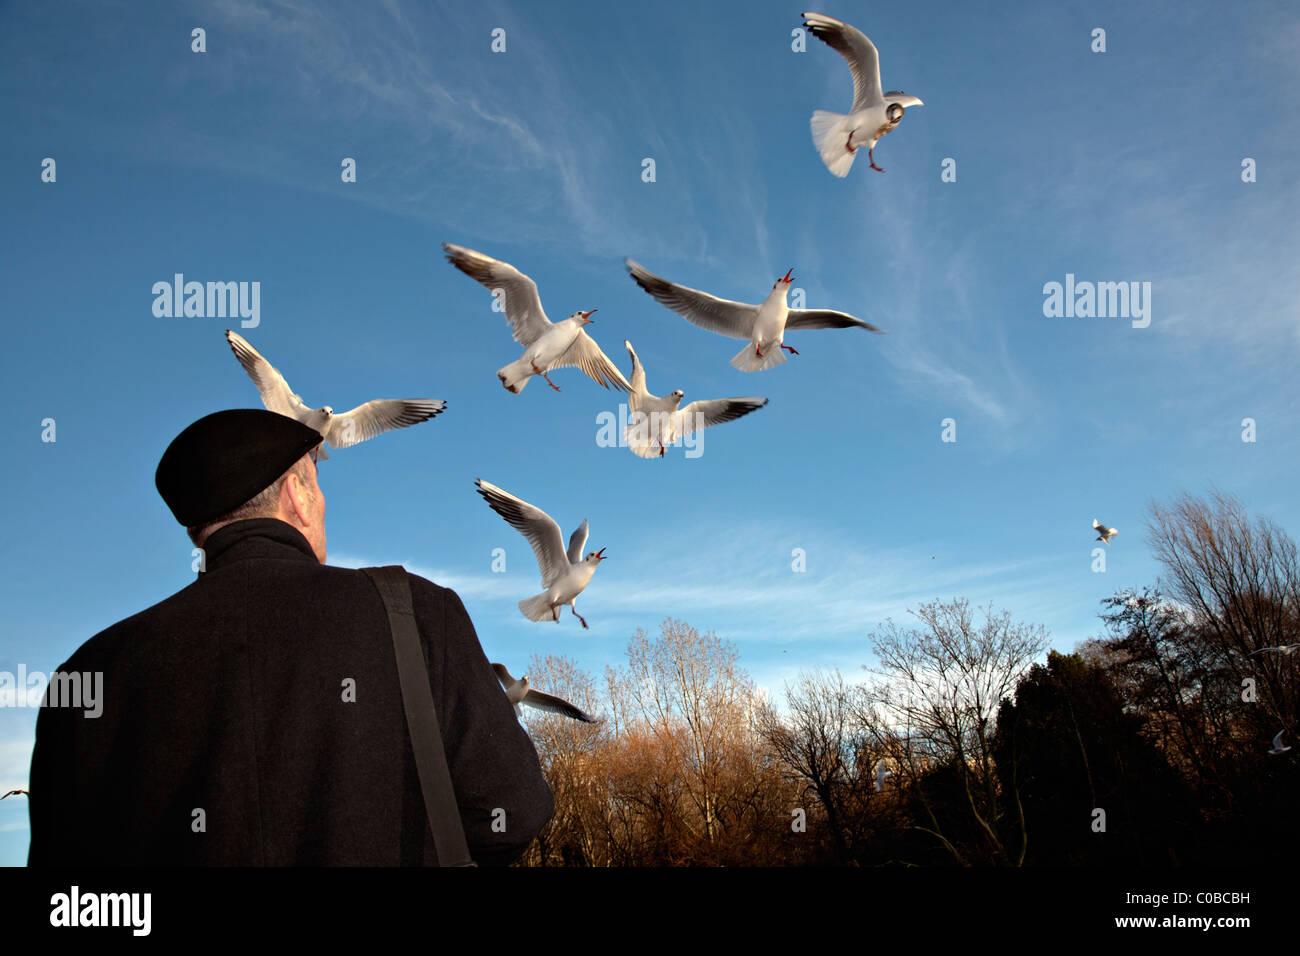 man feeding gulls in london - Stock Image